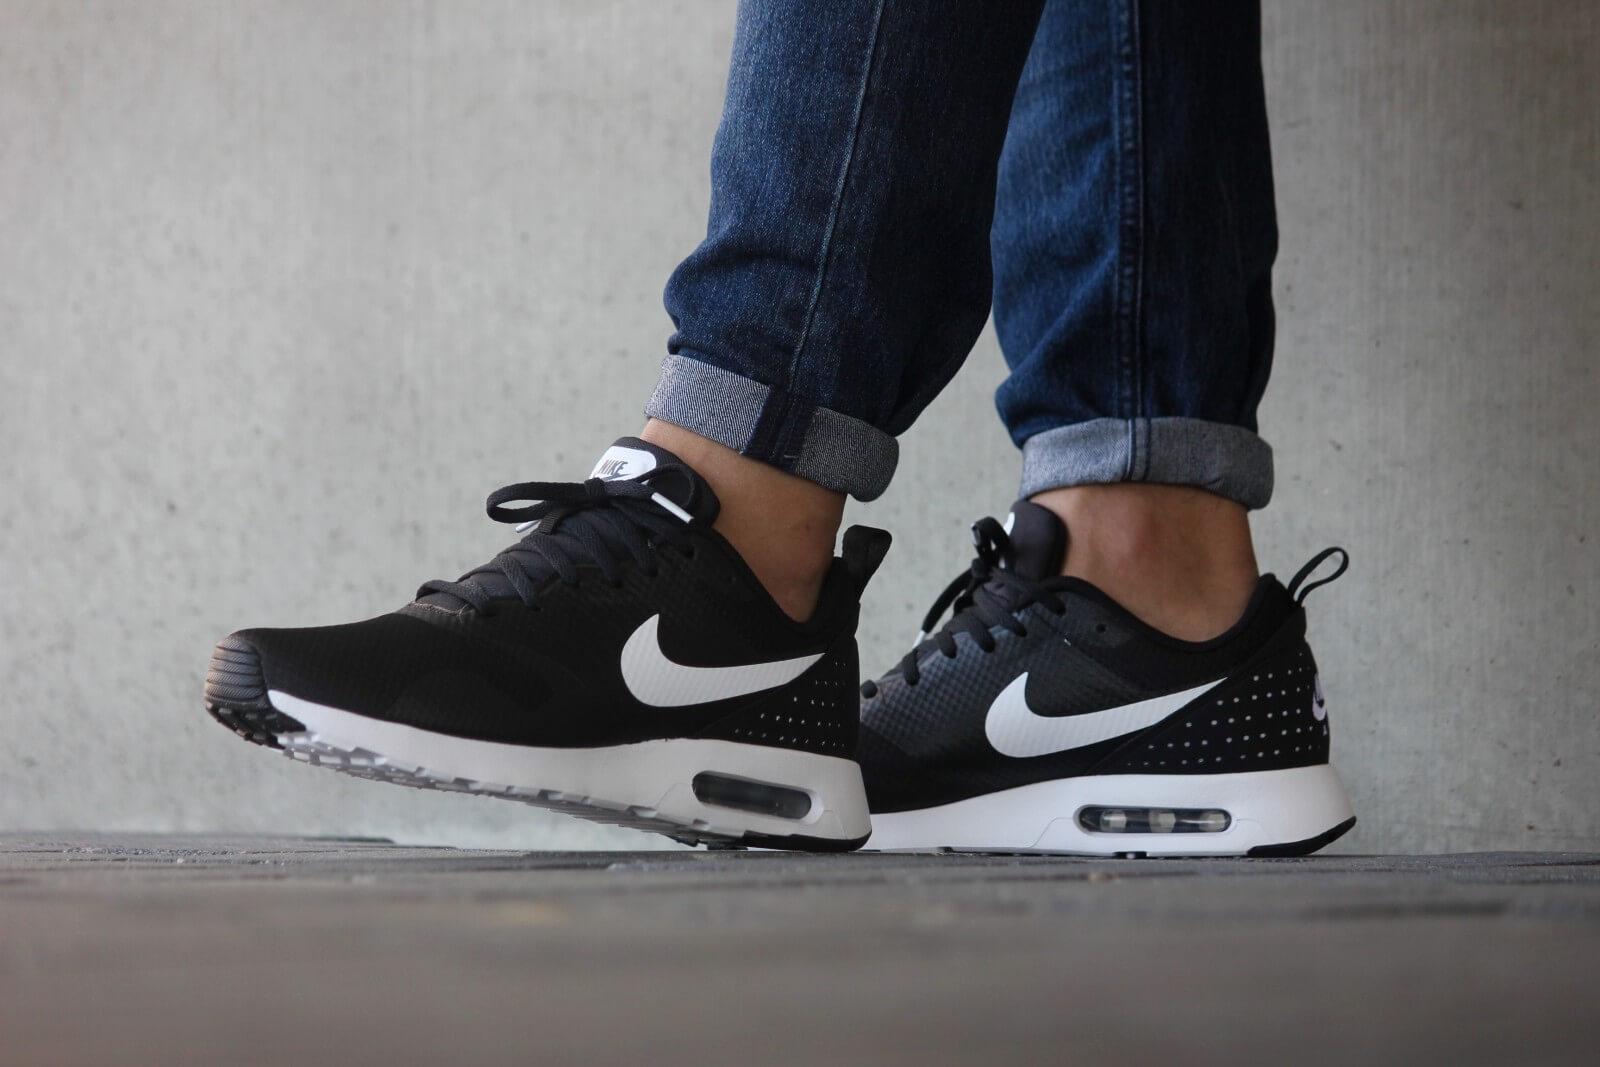 009 White Black Air Nike Black Tavas 705149 Max O6Hw0n